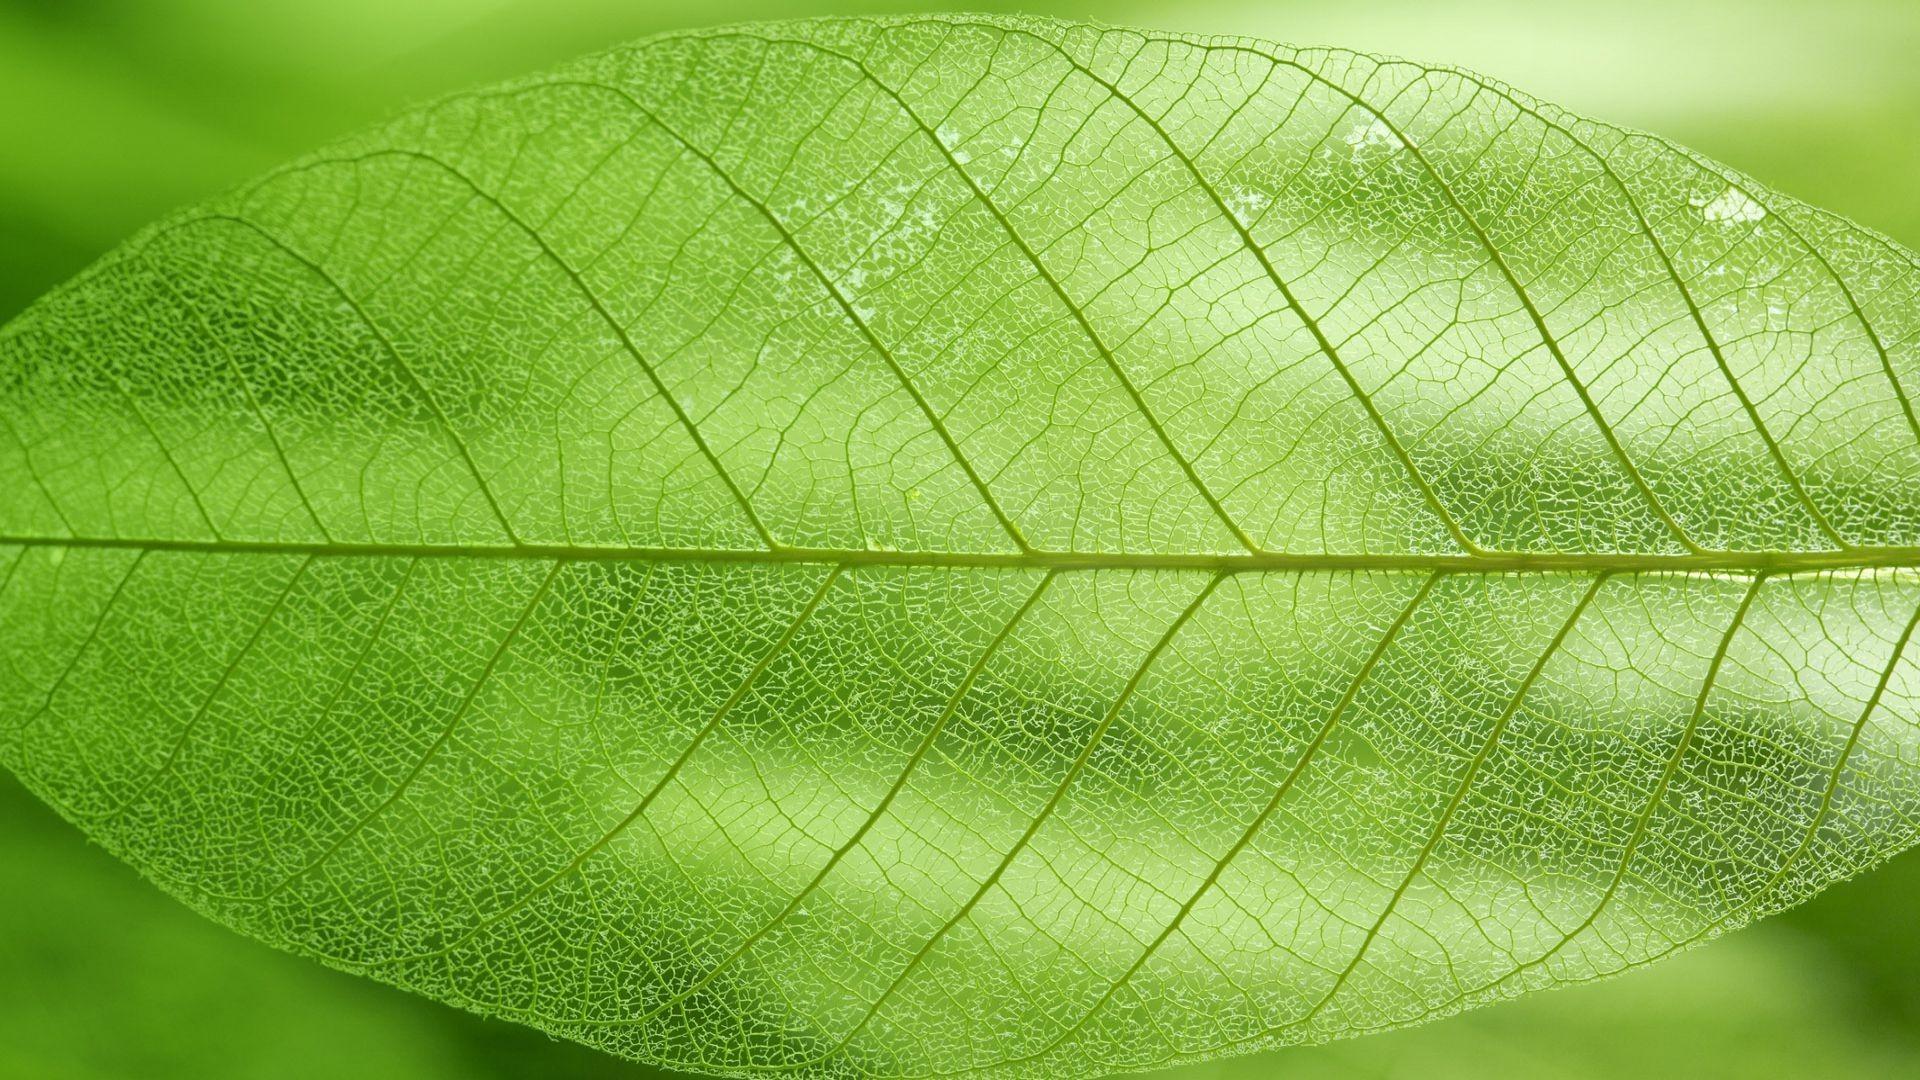 Green leaf wallpaper 8377 1920x1080